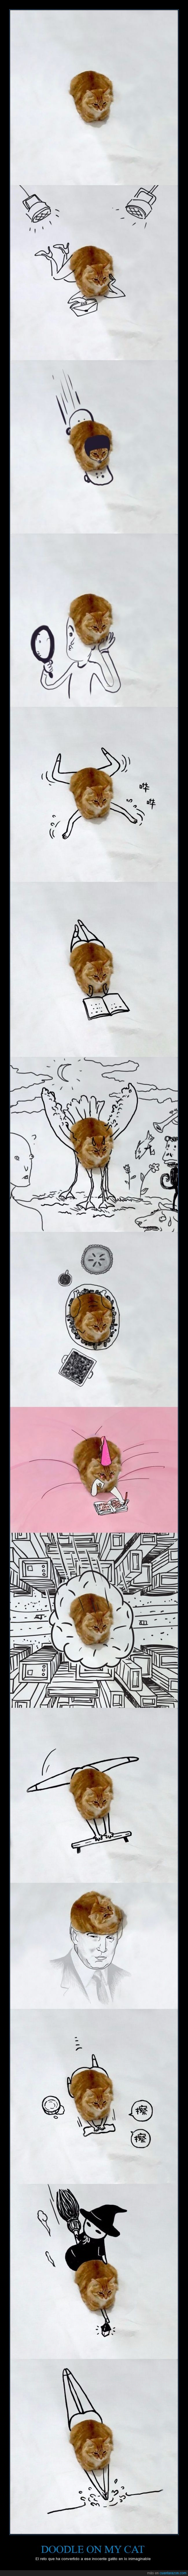 cambiar,chop,dibujar,doodle,gato,photoshop,reto